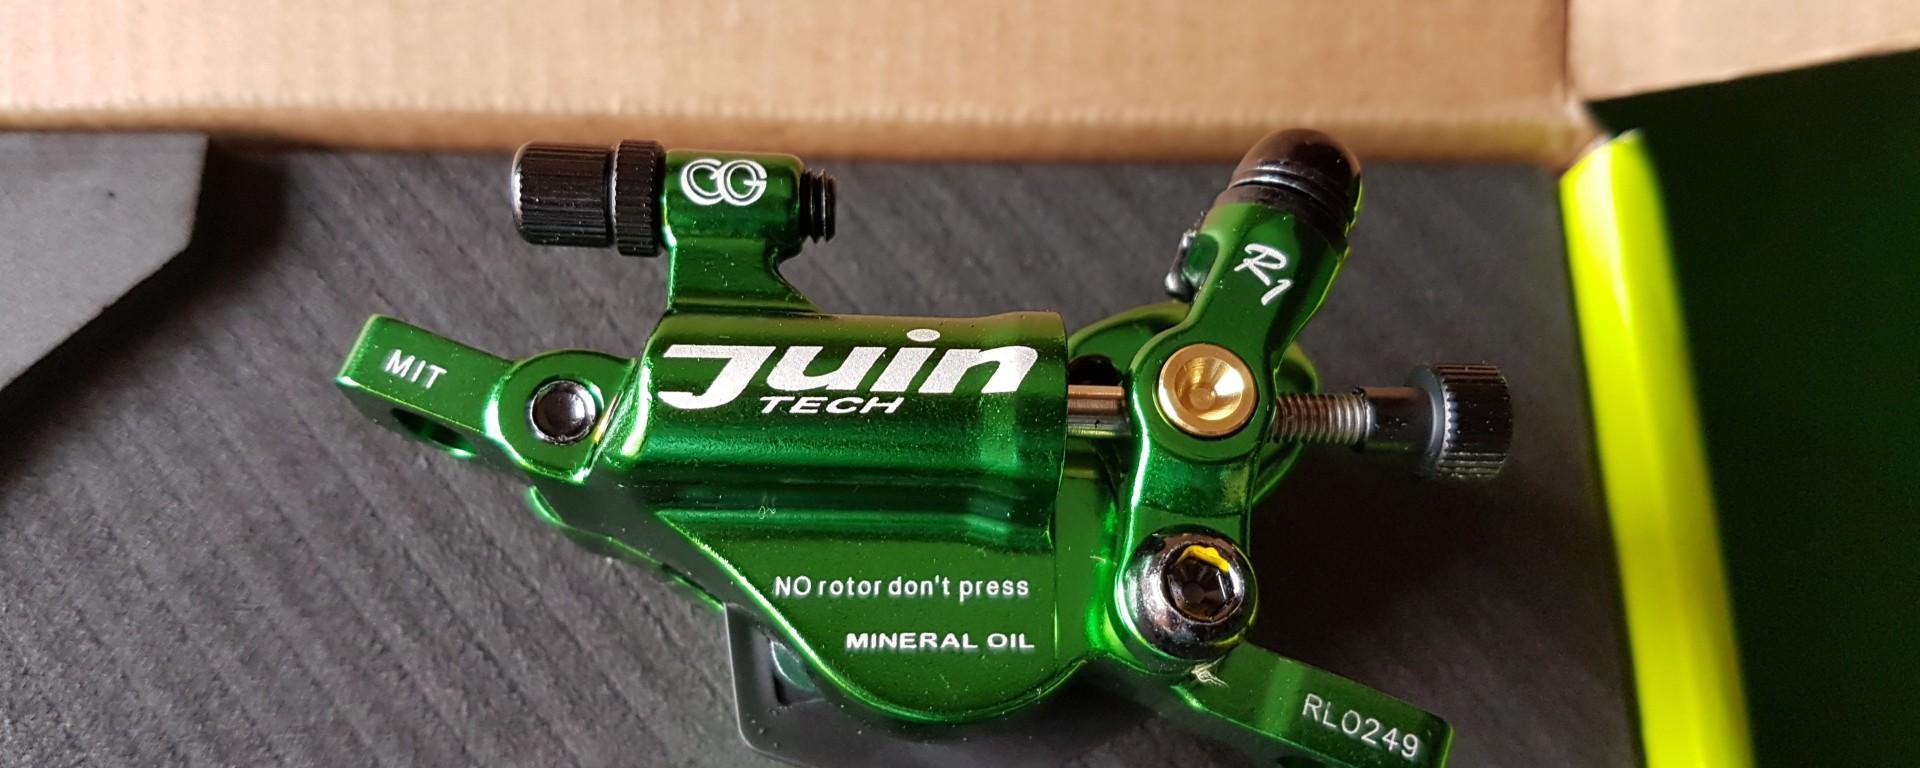 Juin Tech R1 Cable Hydraulic Brakes – RoubaixCycling cc